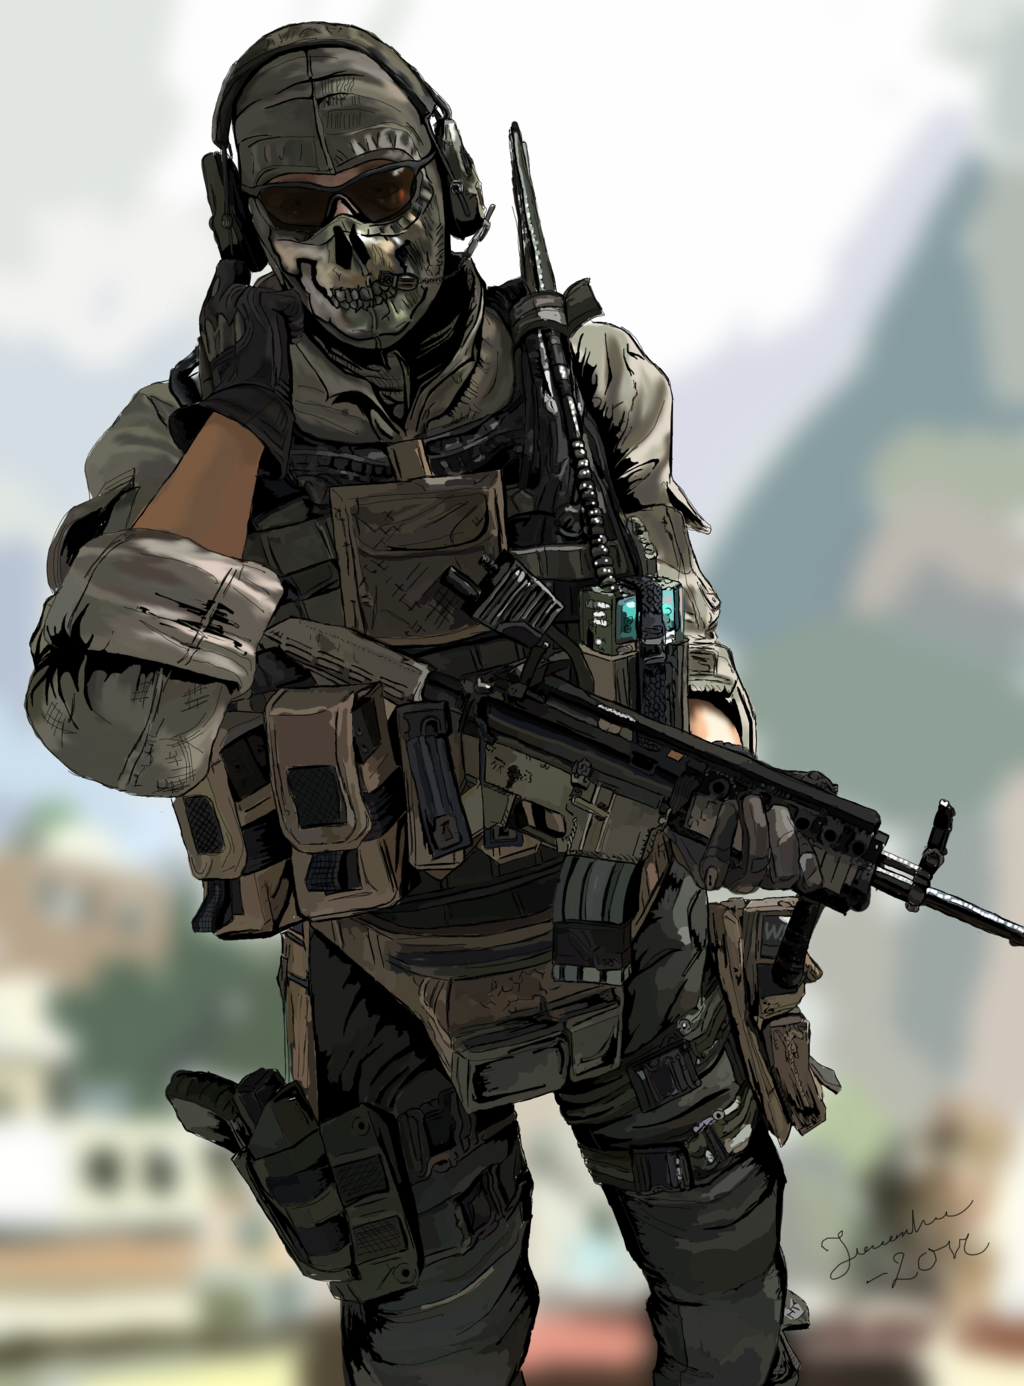 Pin By Giga Moseshvili On Jason Statham My Man Call Of Duty Call Of Duty Ghosts Military Wallpaper